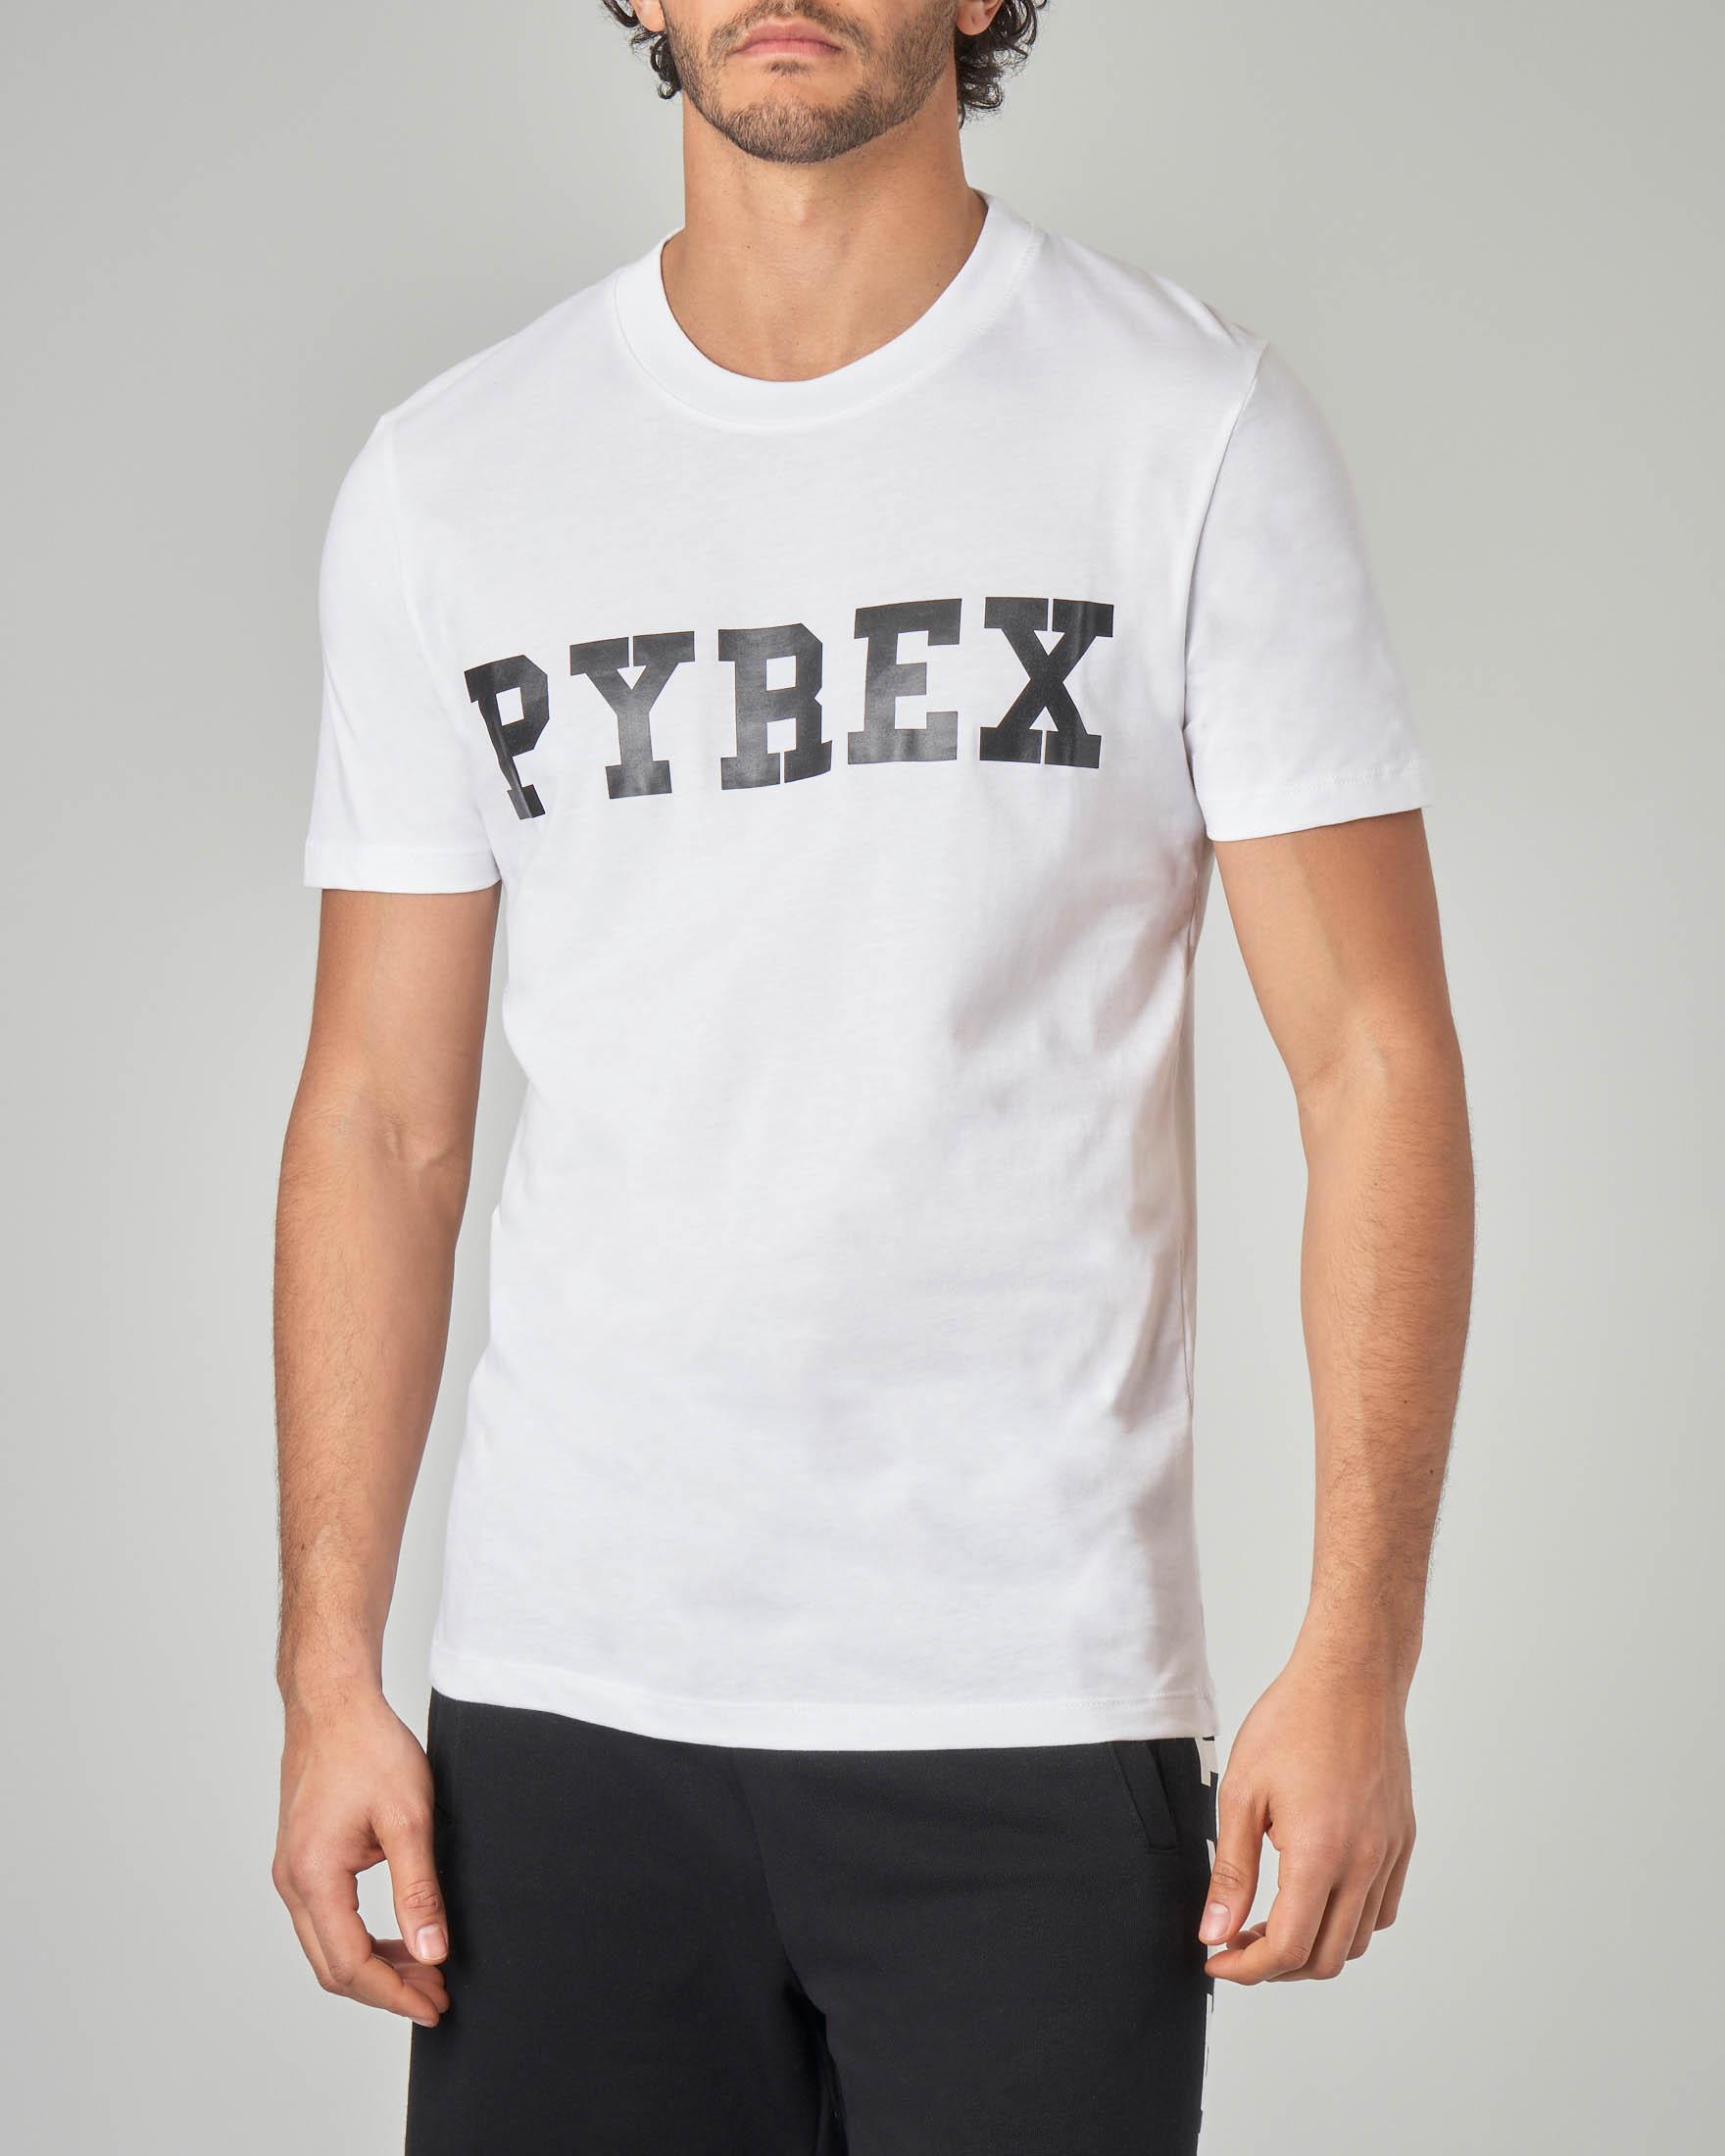 T-shirt bianca con logo nero